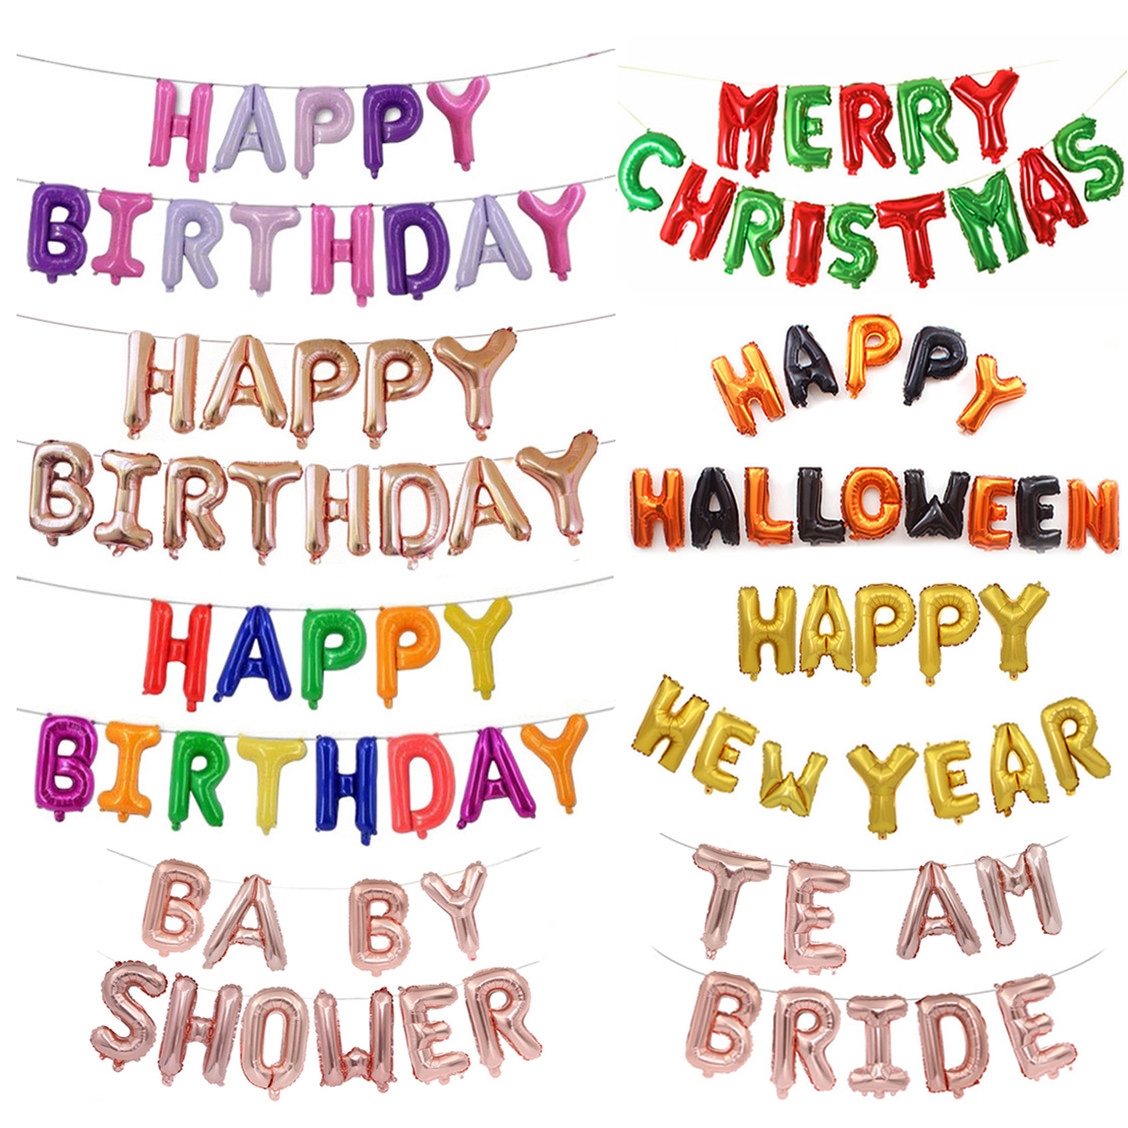 Joyeux Anniversaire Ballon Babyshower Nouvel An Noel Lettre Ballons